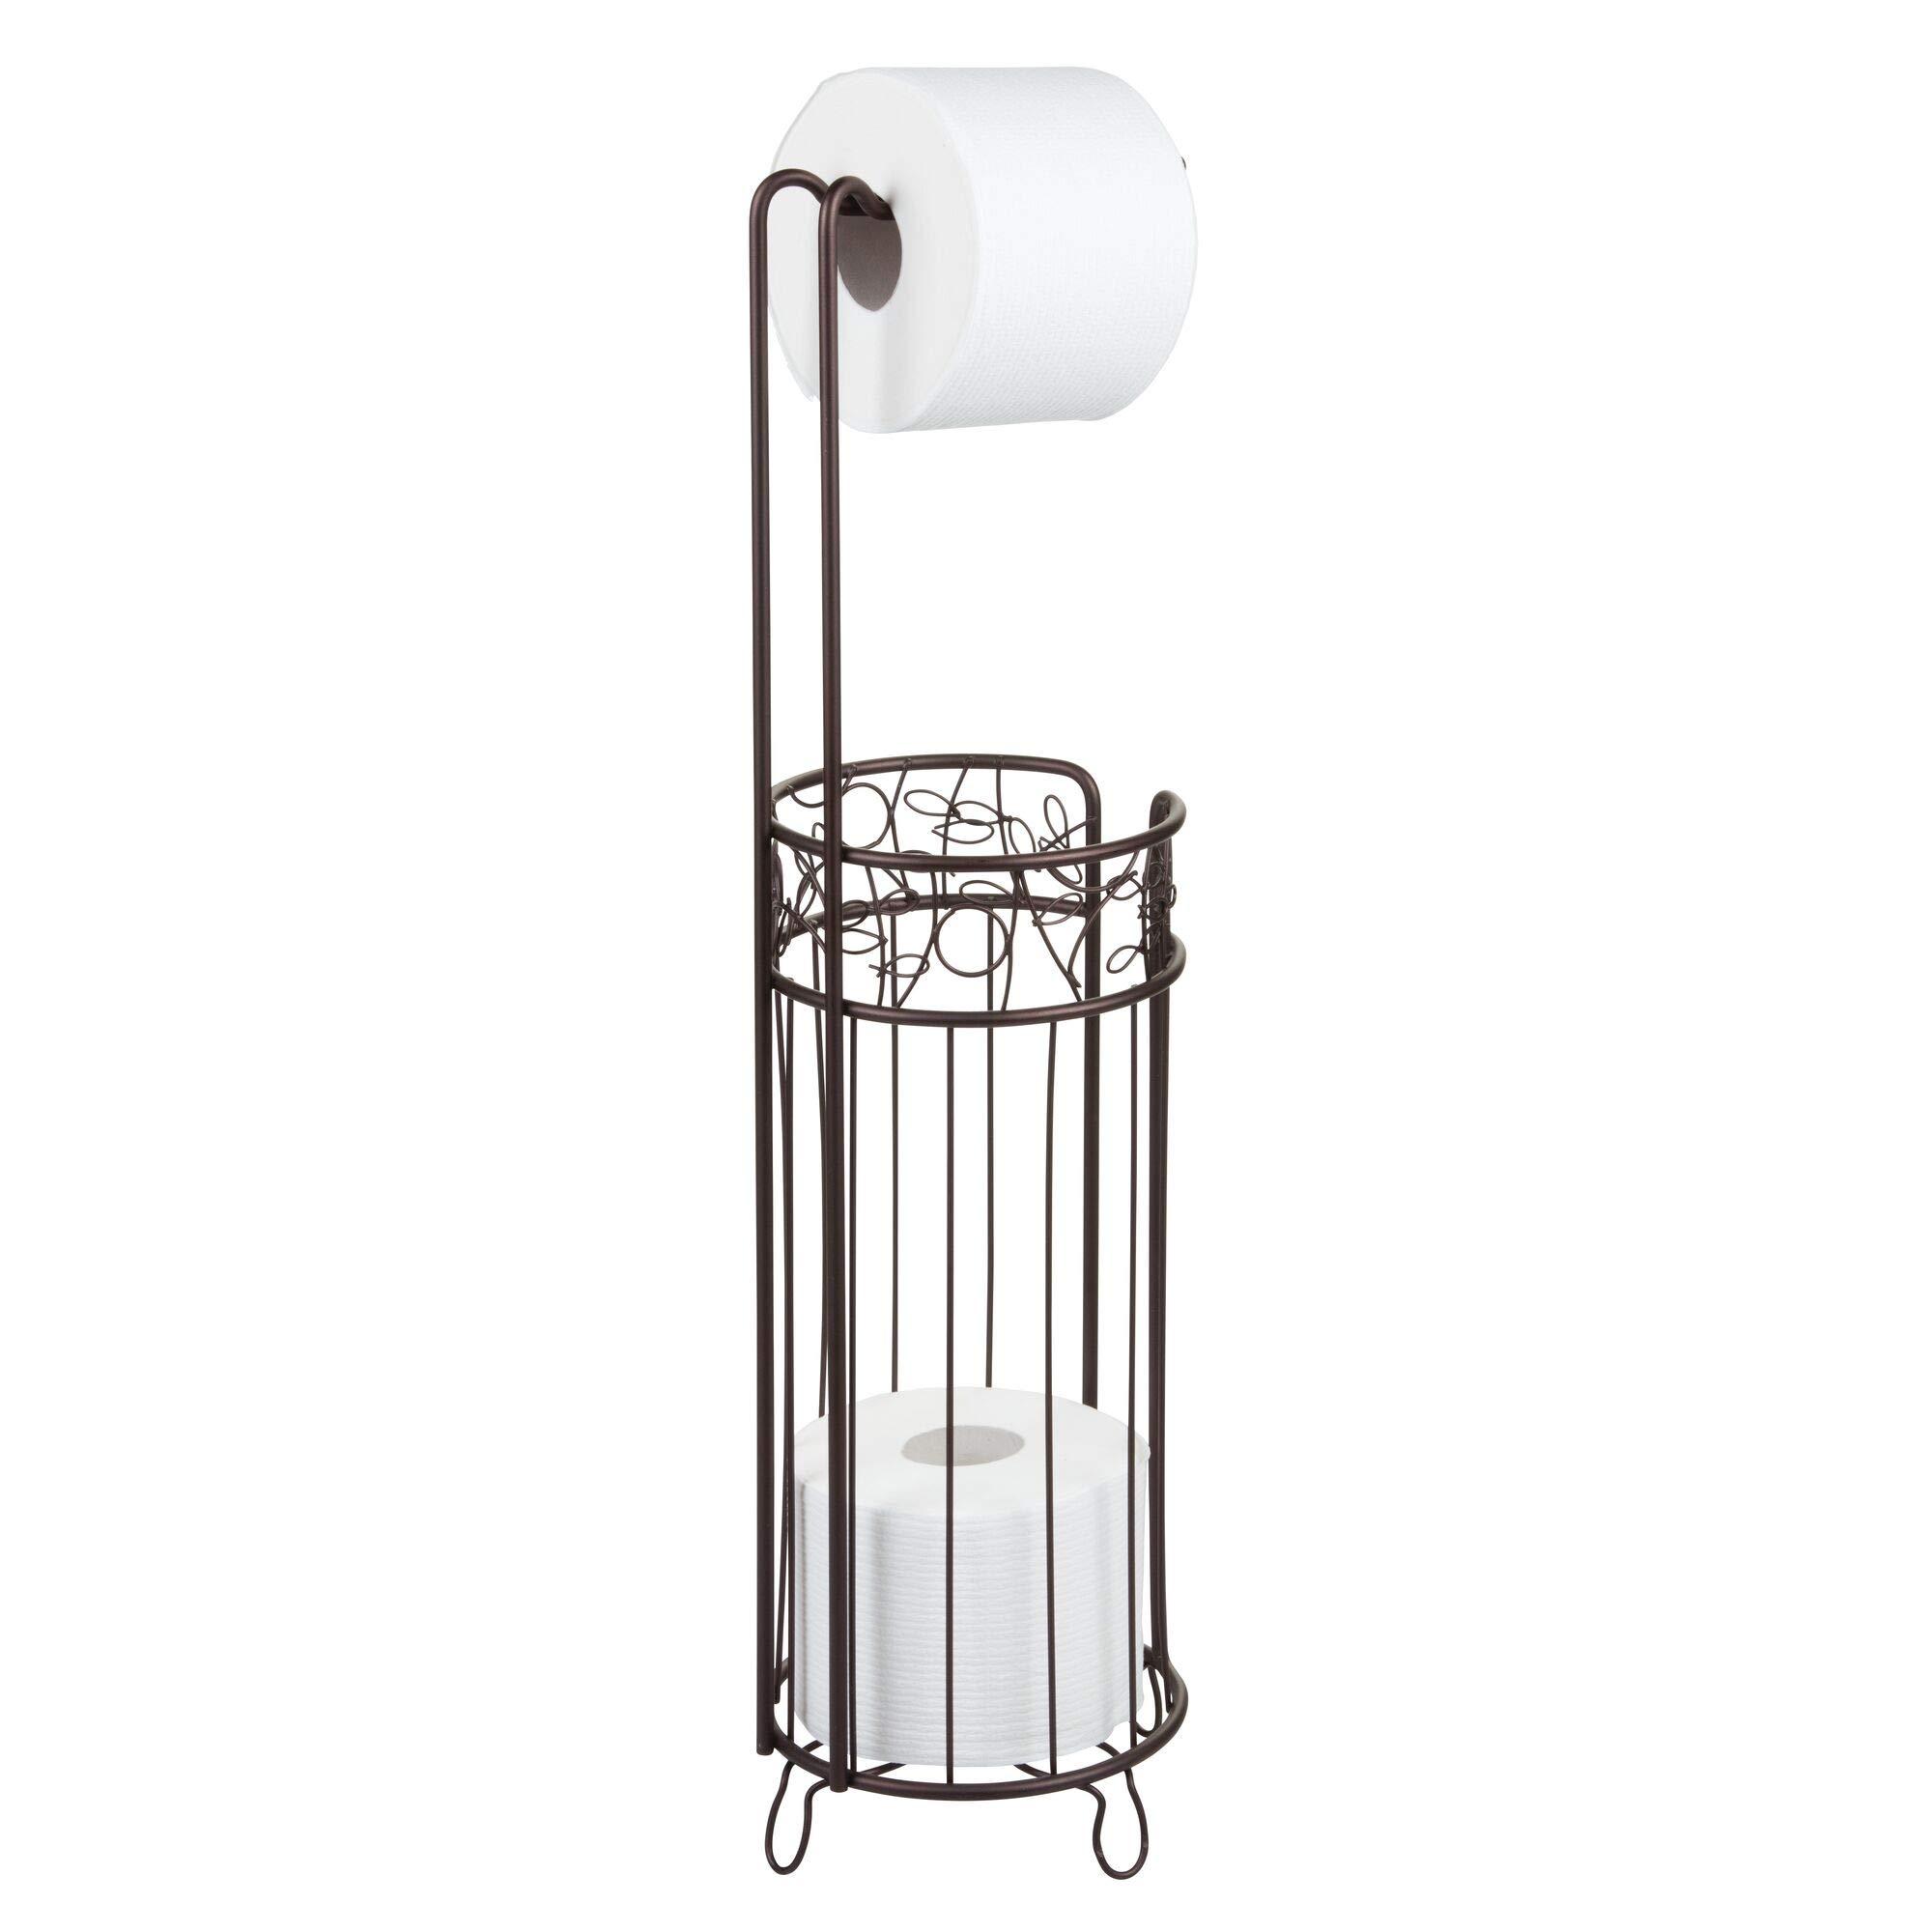 "iDesign Twigz Steel Free-Standing Toilet Paper Storage Dispenser - 7"" x 7"" x 25"", Bronze"